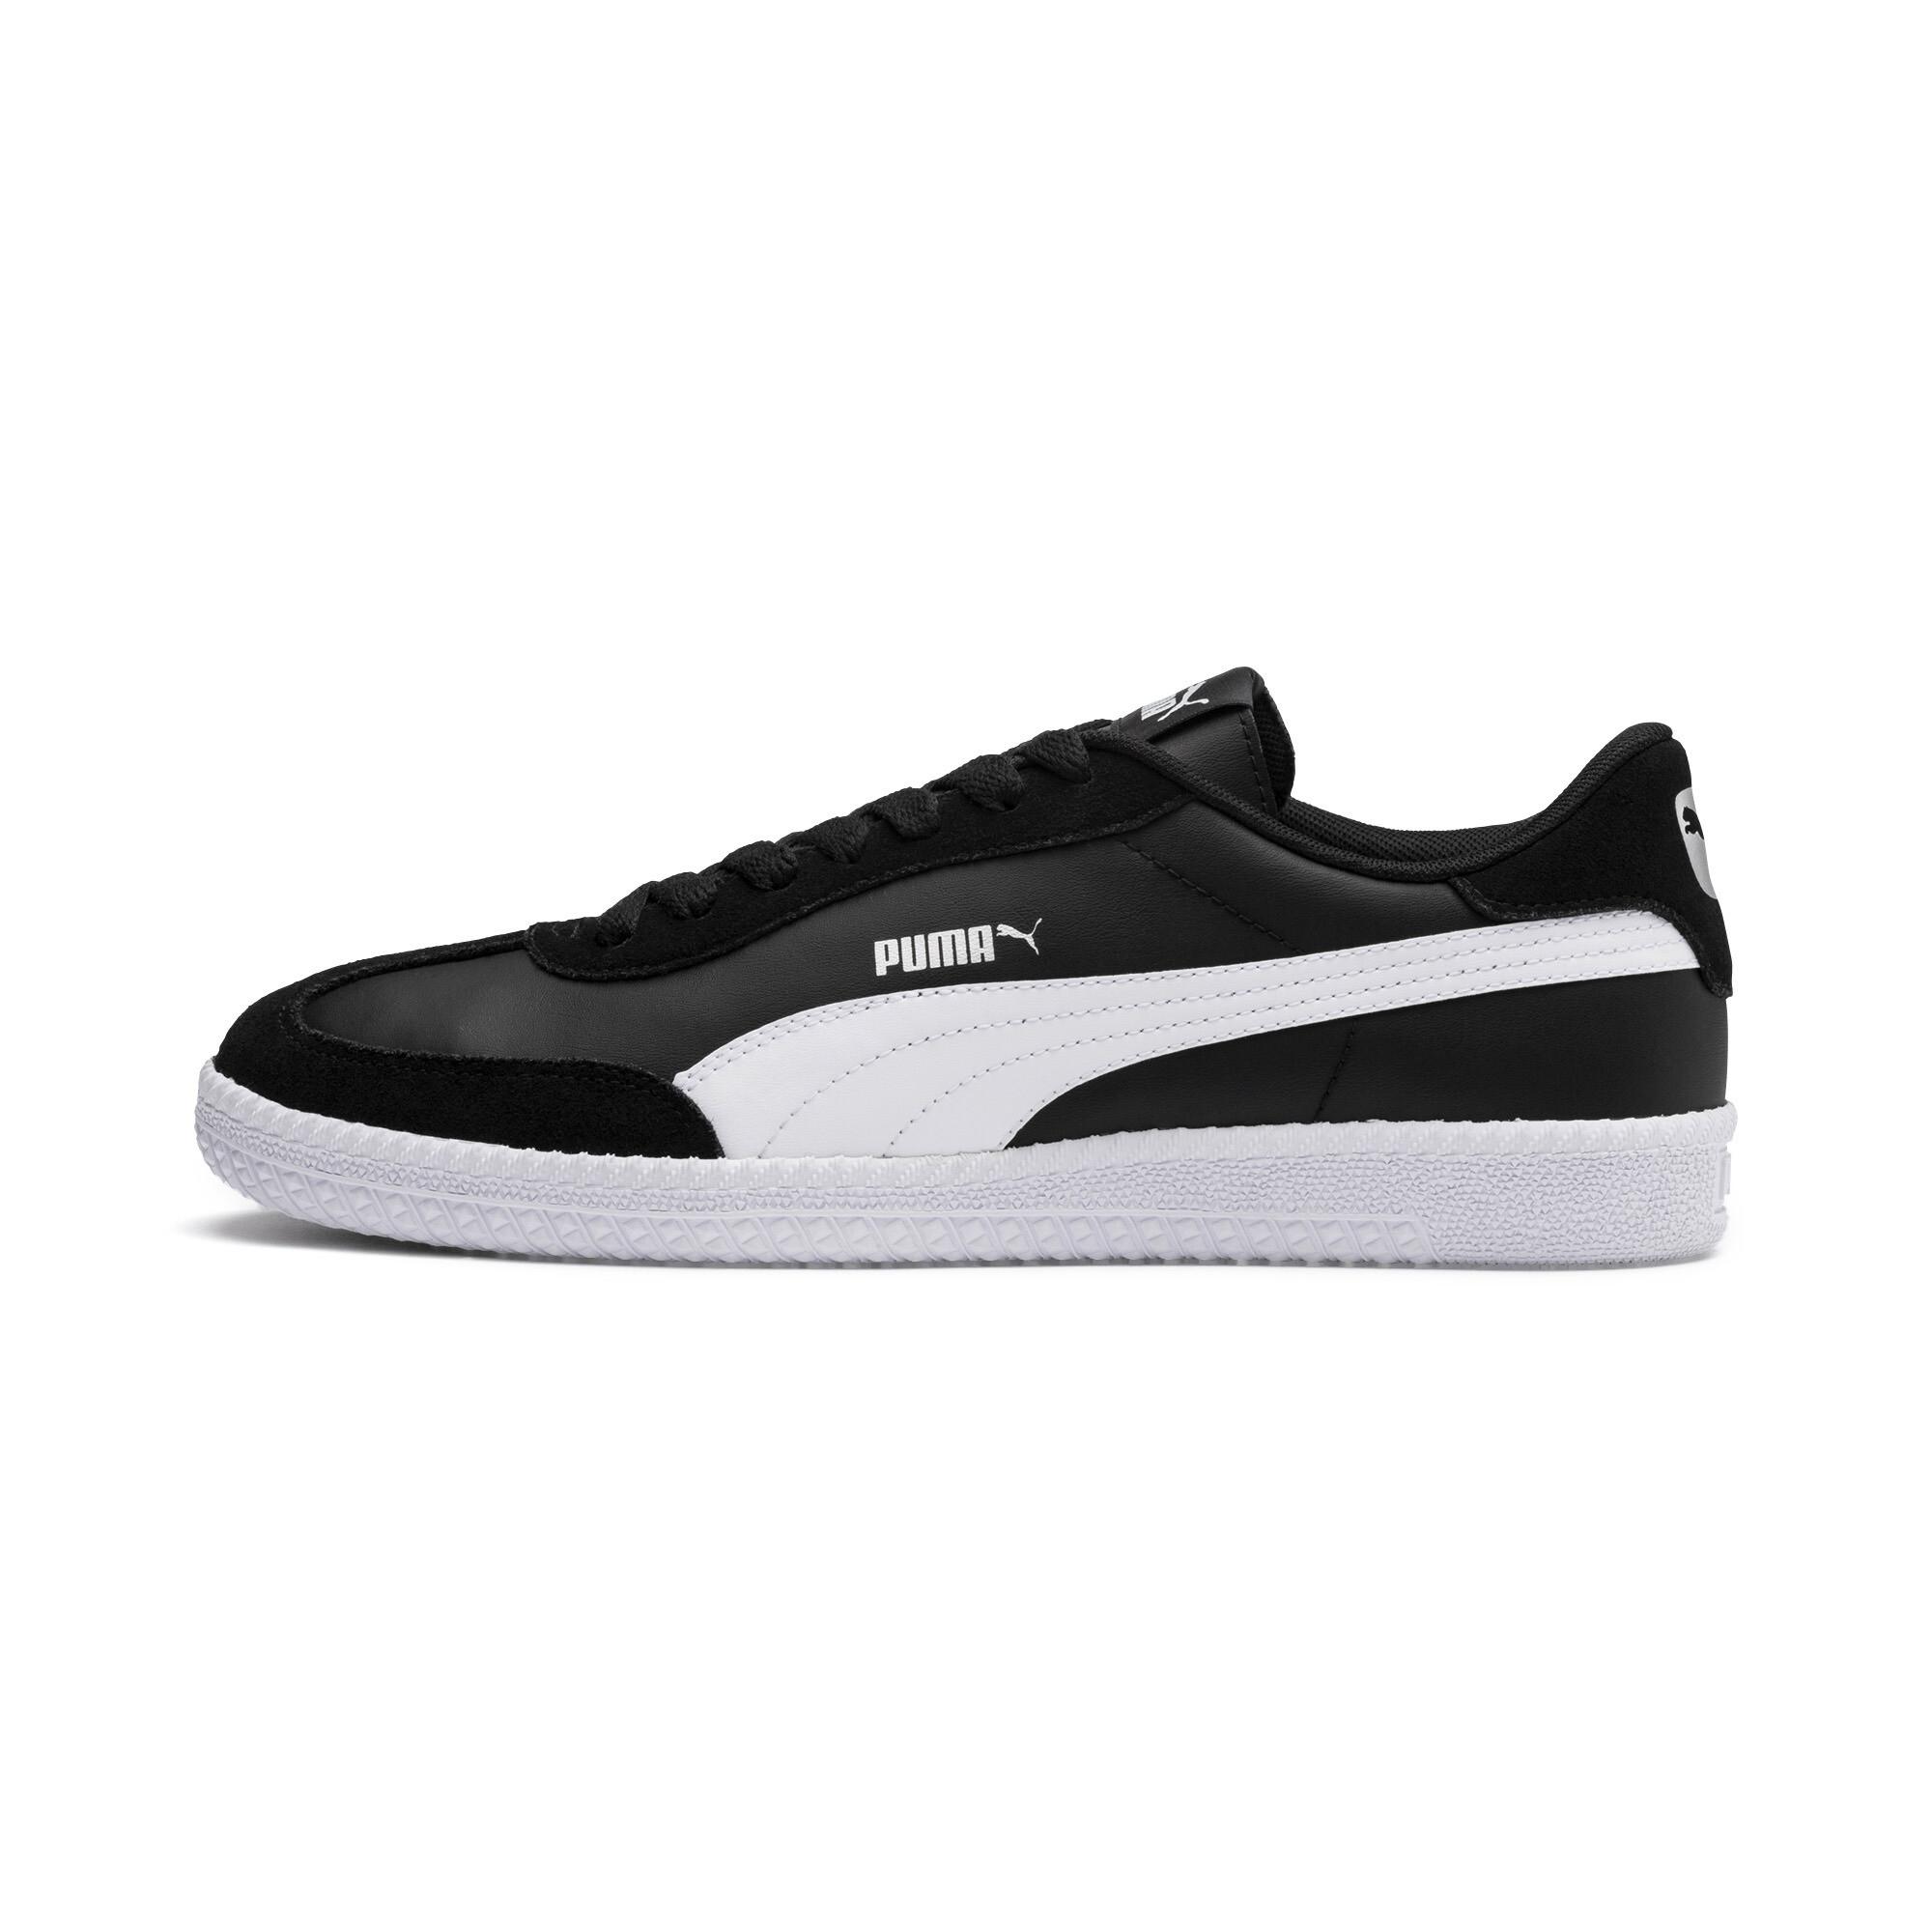 PUMA-Astro-Cup-Sneakers-Men-Shoe-Basics thumbnail 4